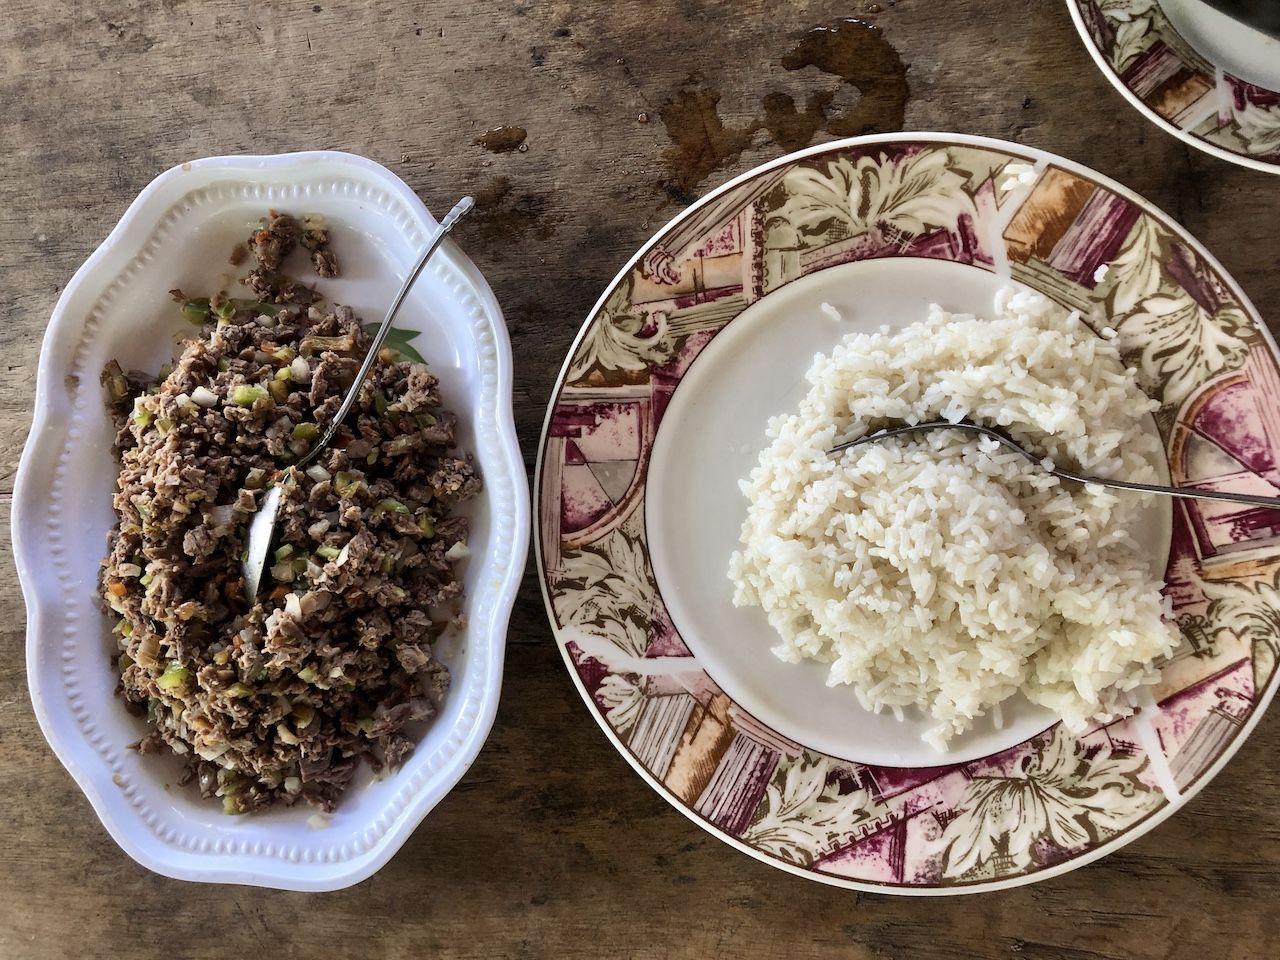 Salpicon Nicaraguan food